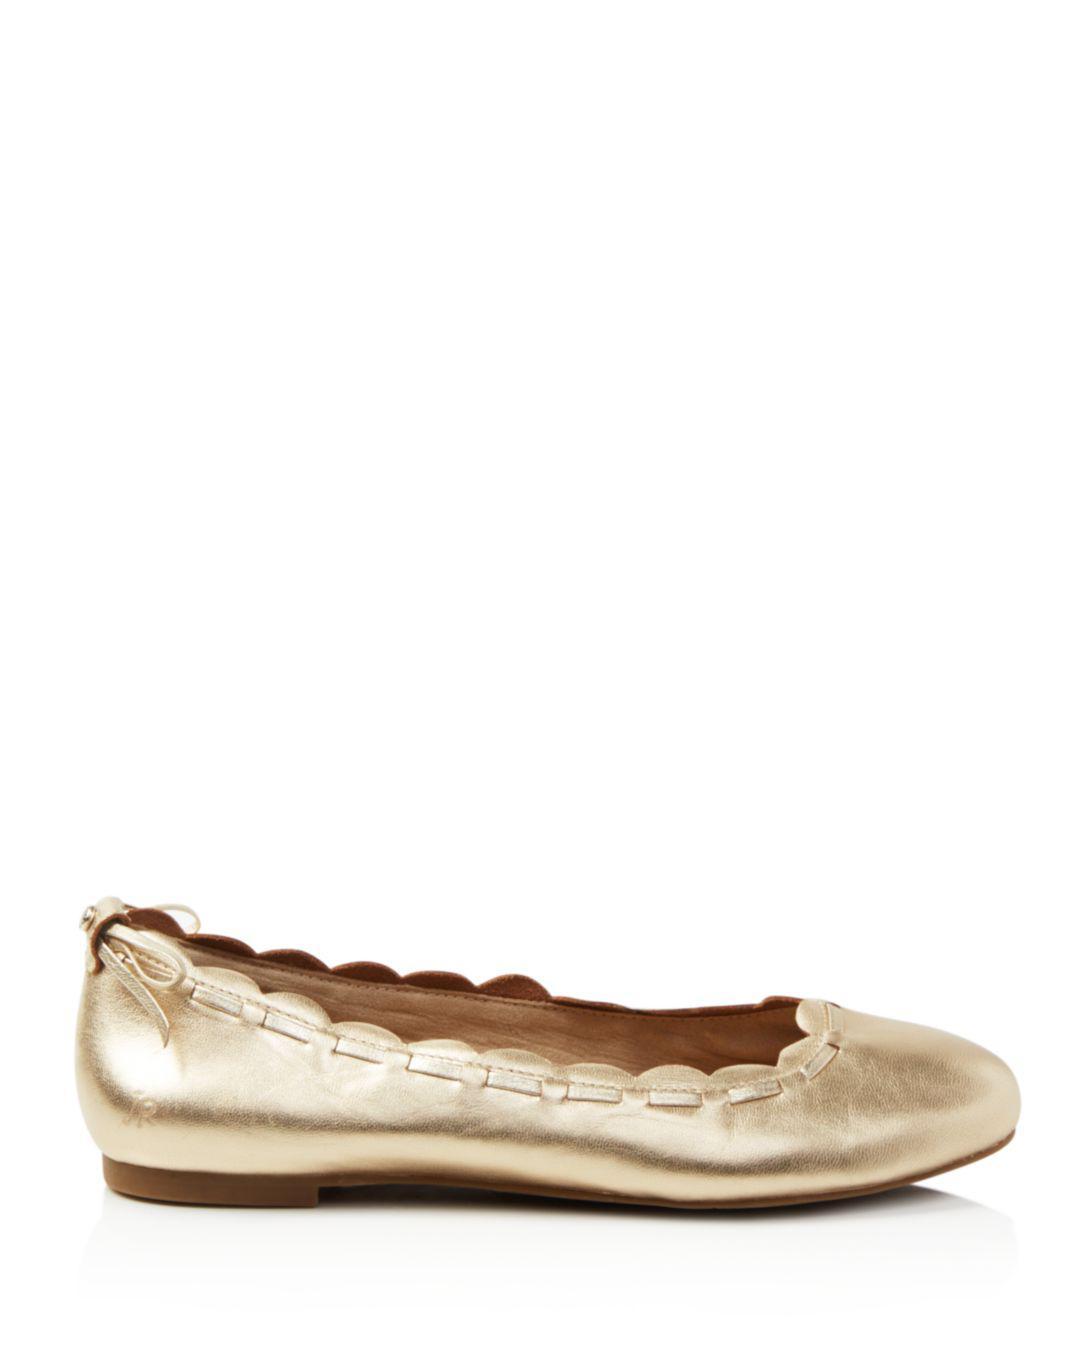 814800bdba55c Women's Lucie Leather Flats